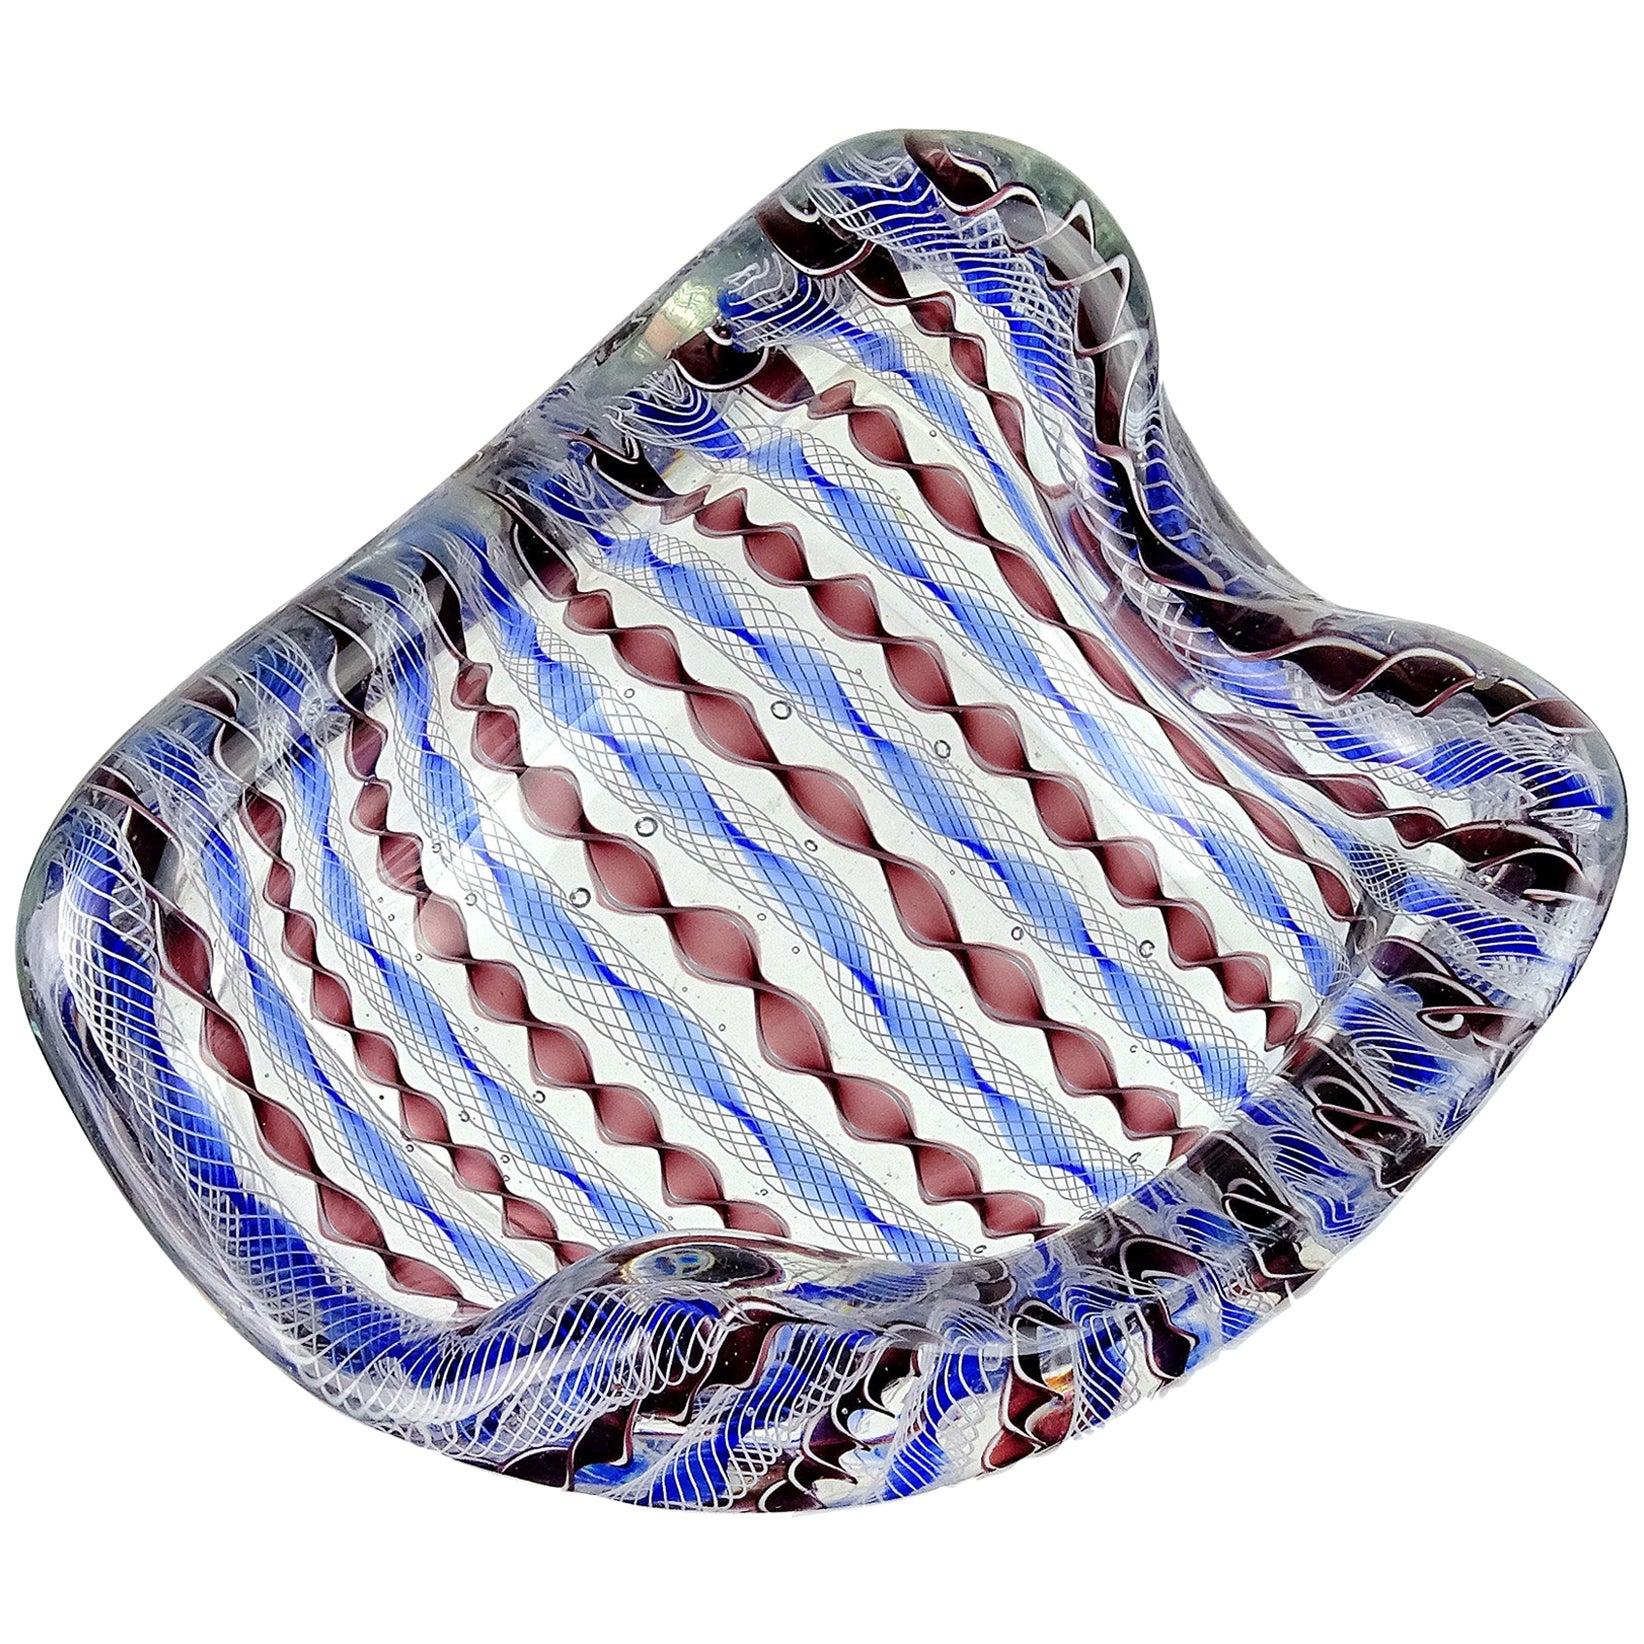 Archimede Seguso Murano Blue Zanfirico Latticino Ribbons Italian Art Glass Bowl